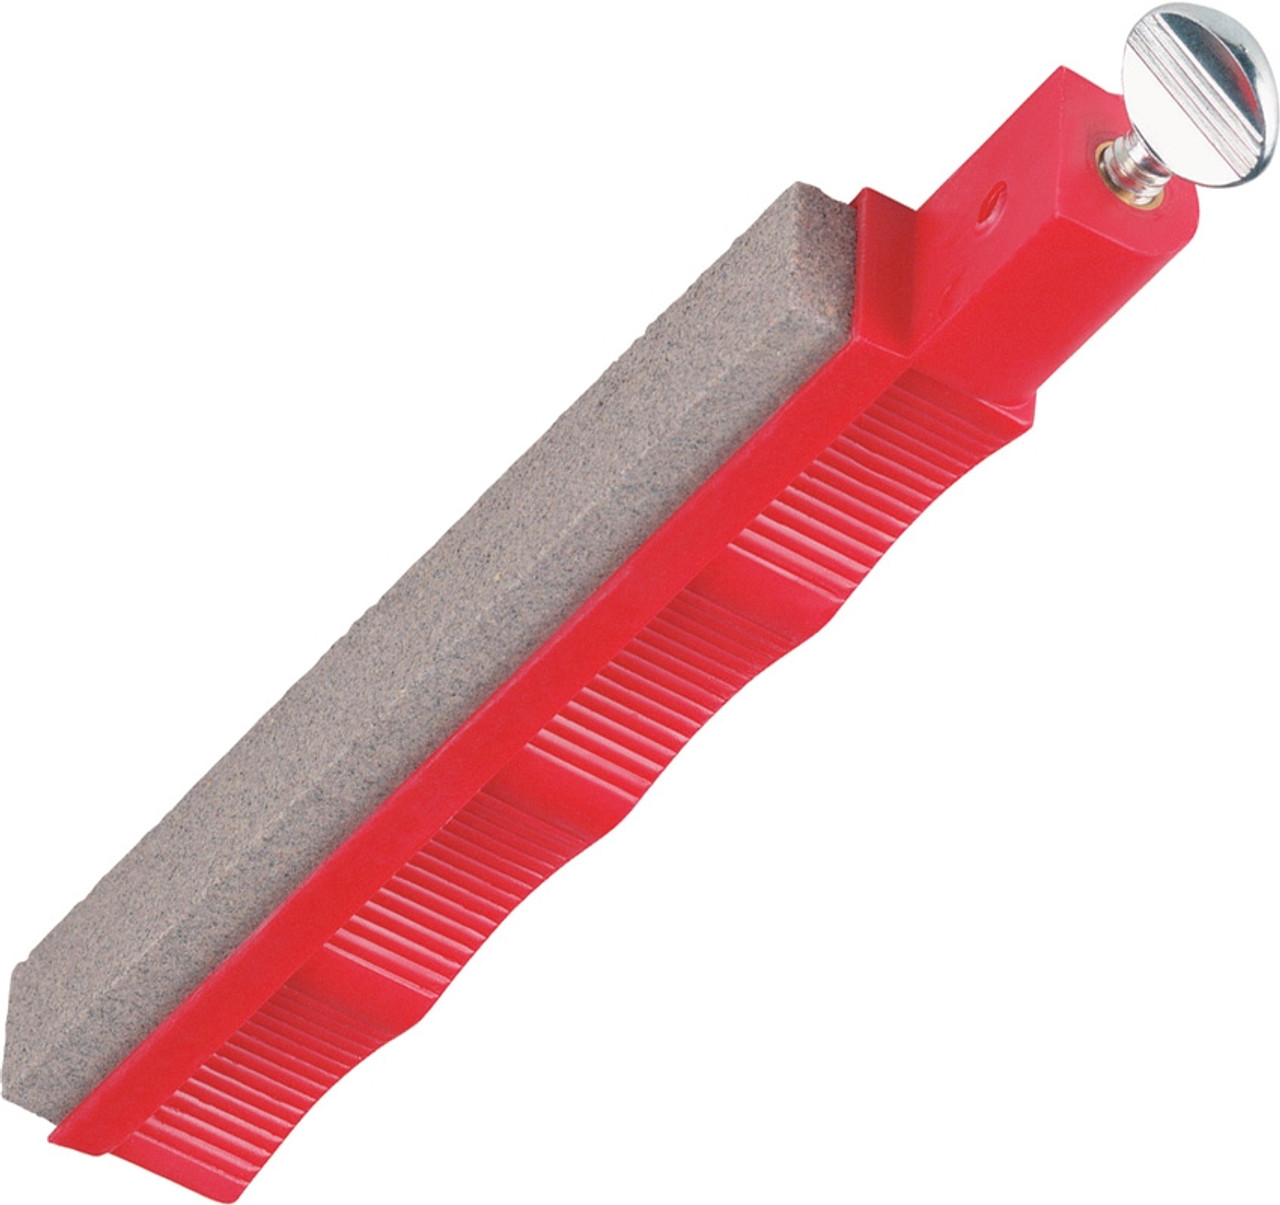 Lansky Alumina-Oxide Coarse Sharpening Hone